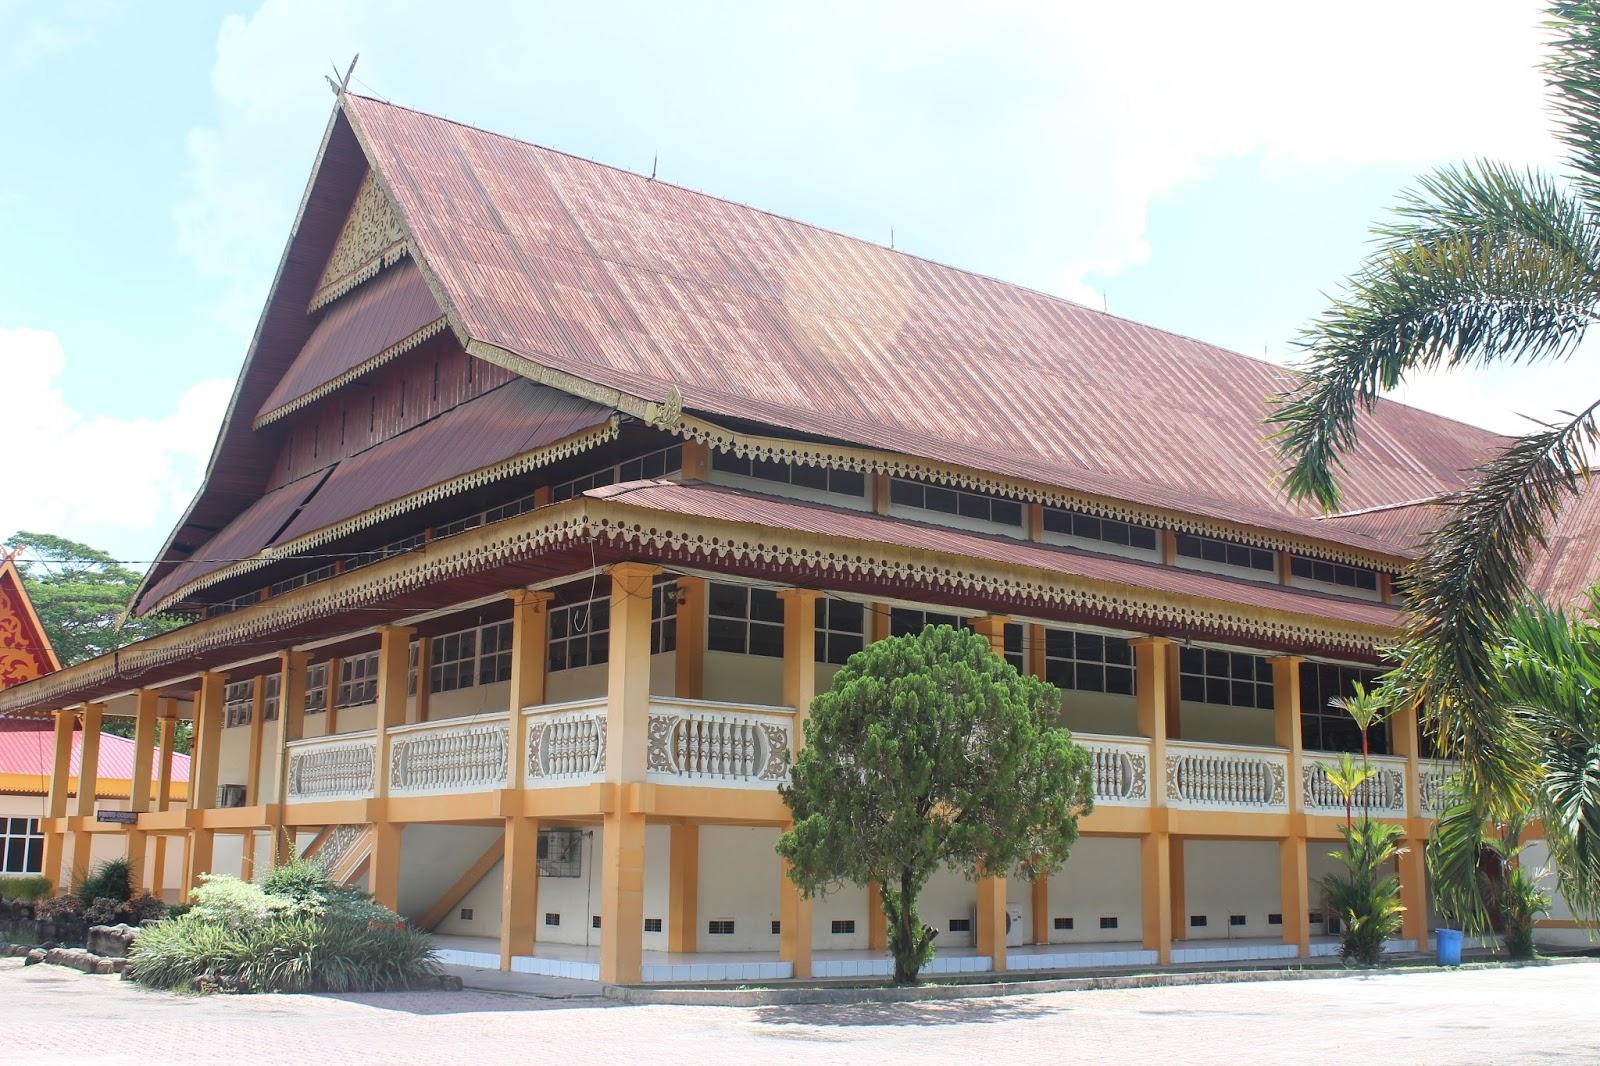 Jangan Lupa Tempat Kamu Berlibur Tanah Melayu Museum Nila Utama